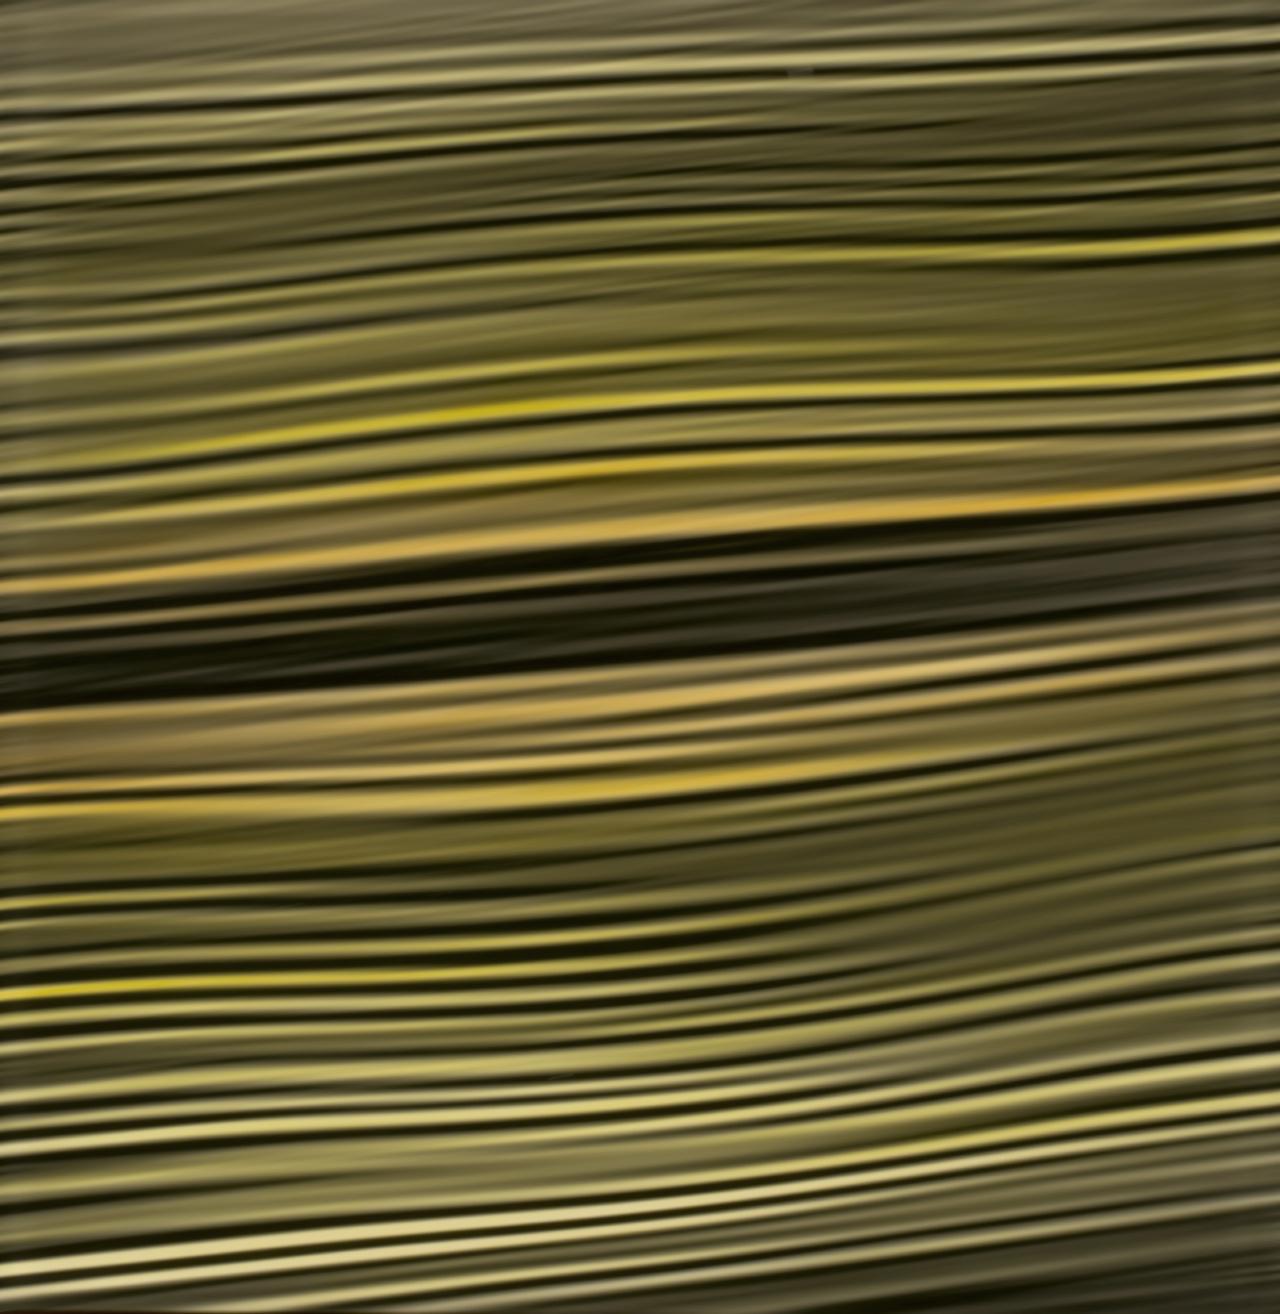 Galleria Fonti GIUSEPPE CAPOGROSSI – PIETRO CONSAGRA – FABIAN MARTI SEB PATANE – PAUL THOREL – PHILADELPHIA WIREMAN- Colloquio Mitico